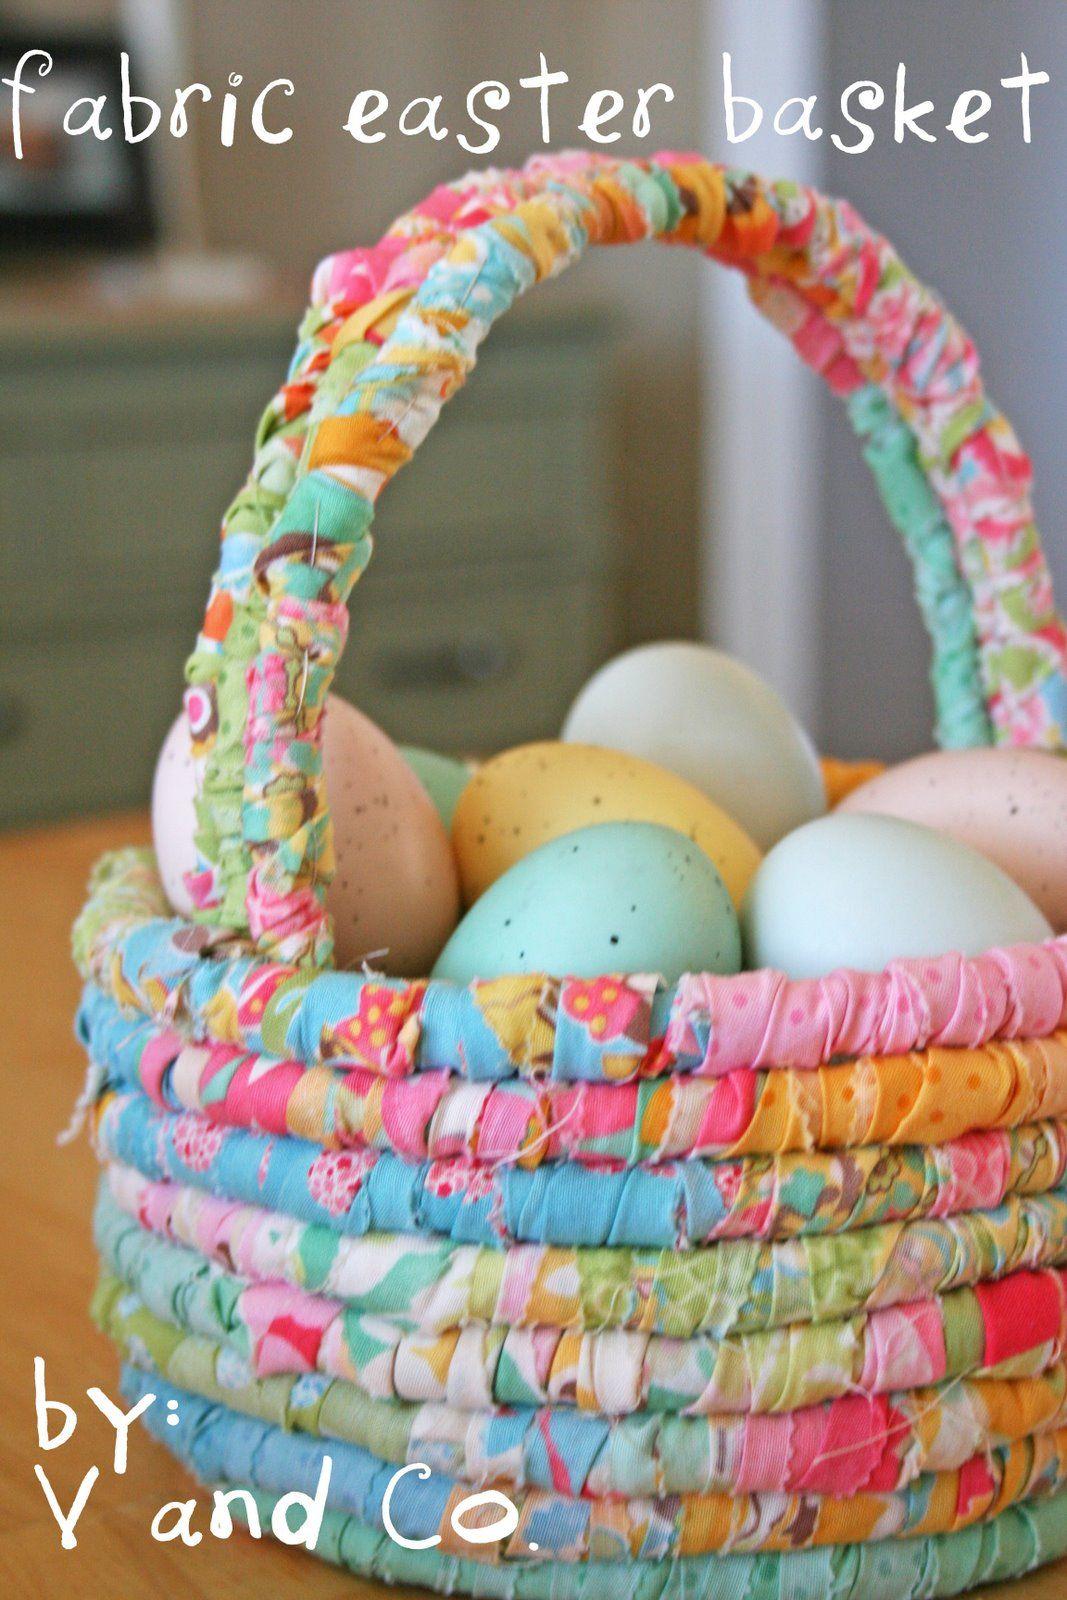 Fabric Easter Basket. Tutorial @ http://www.modabakeshop.com/2009/03/fabric-easter-basket.html?m=1